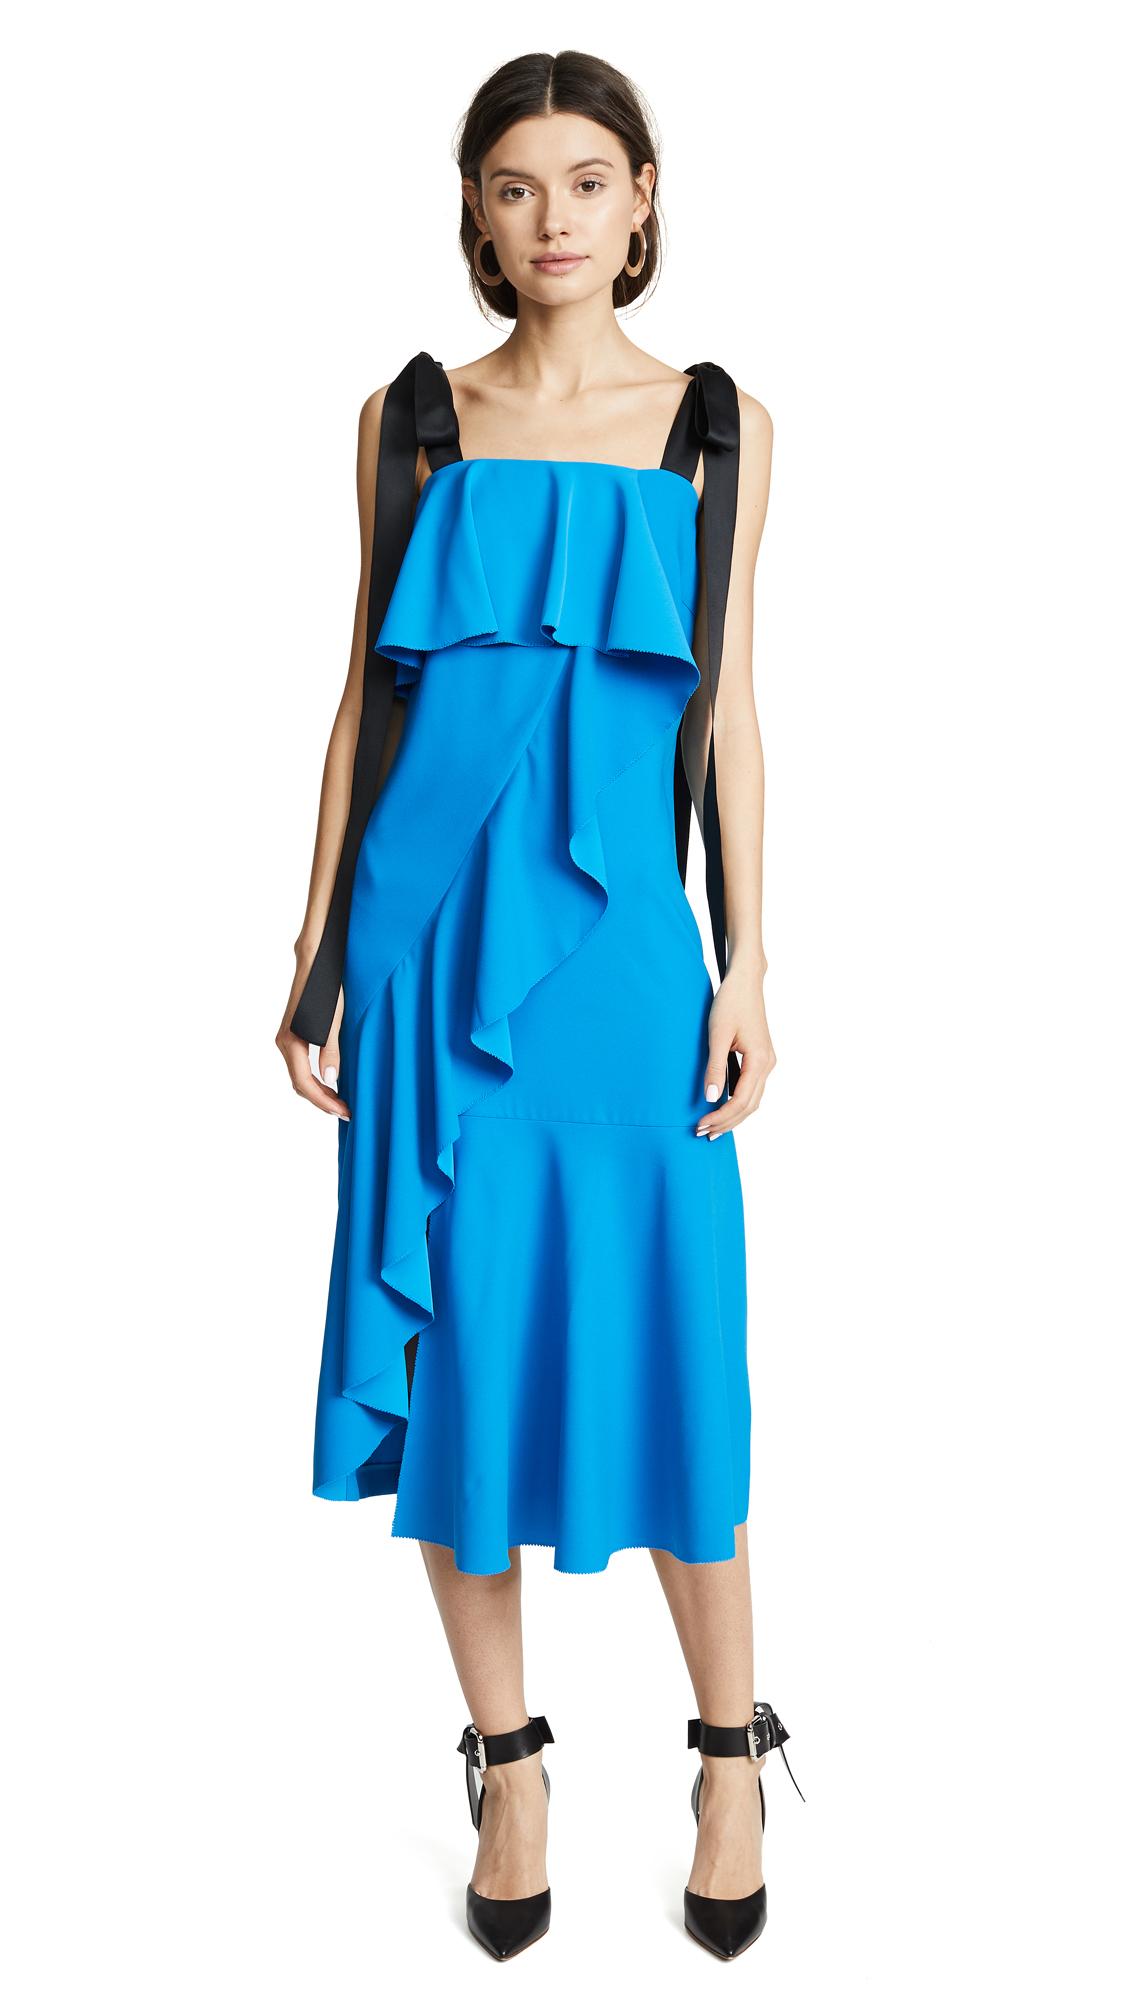 GOEN.J Ruffle Trimmed Midi Dress